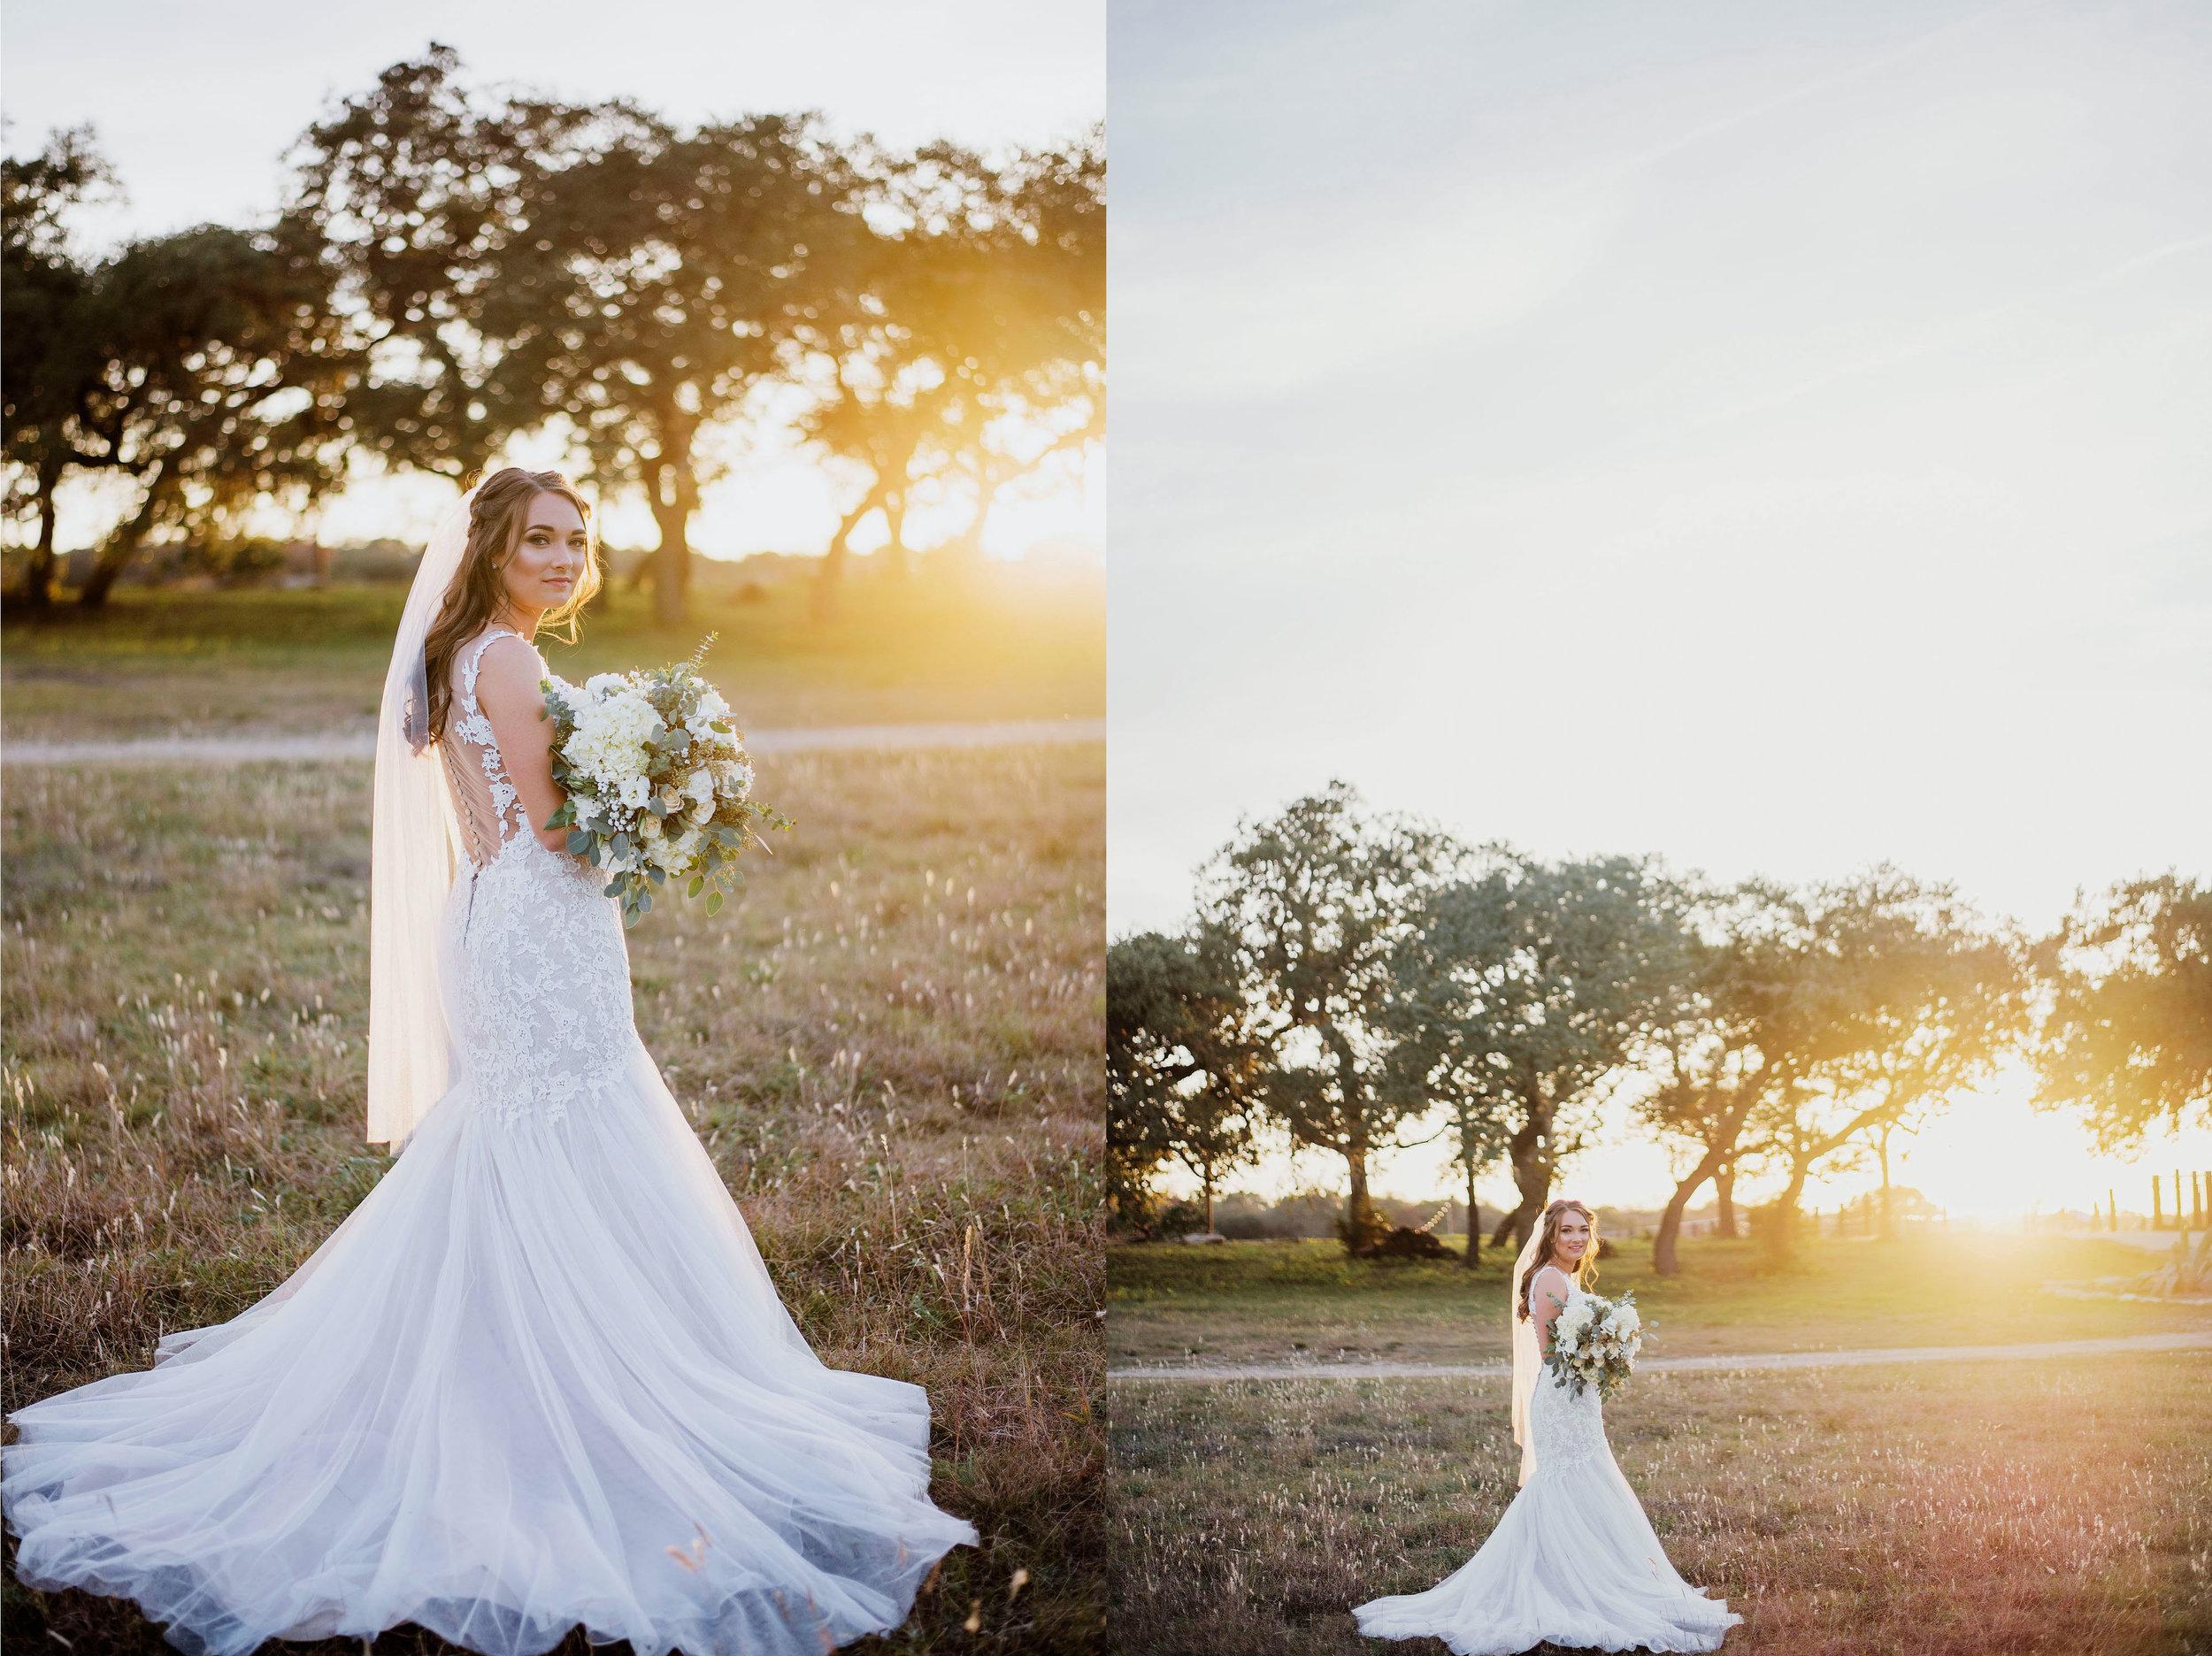 EffJay Photography Destination Wedding Photographer Austin TX Bridal Session La Estancia Bella015.jpg